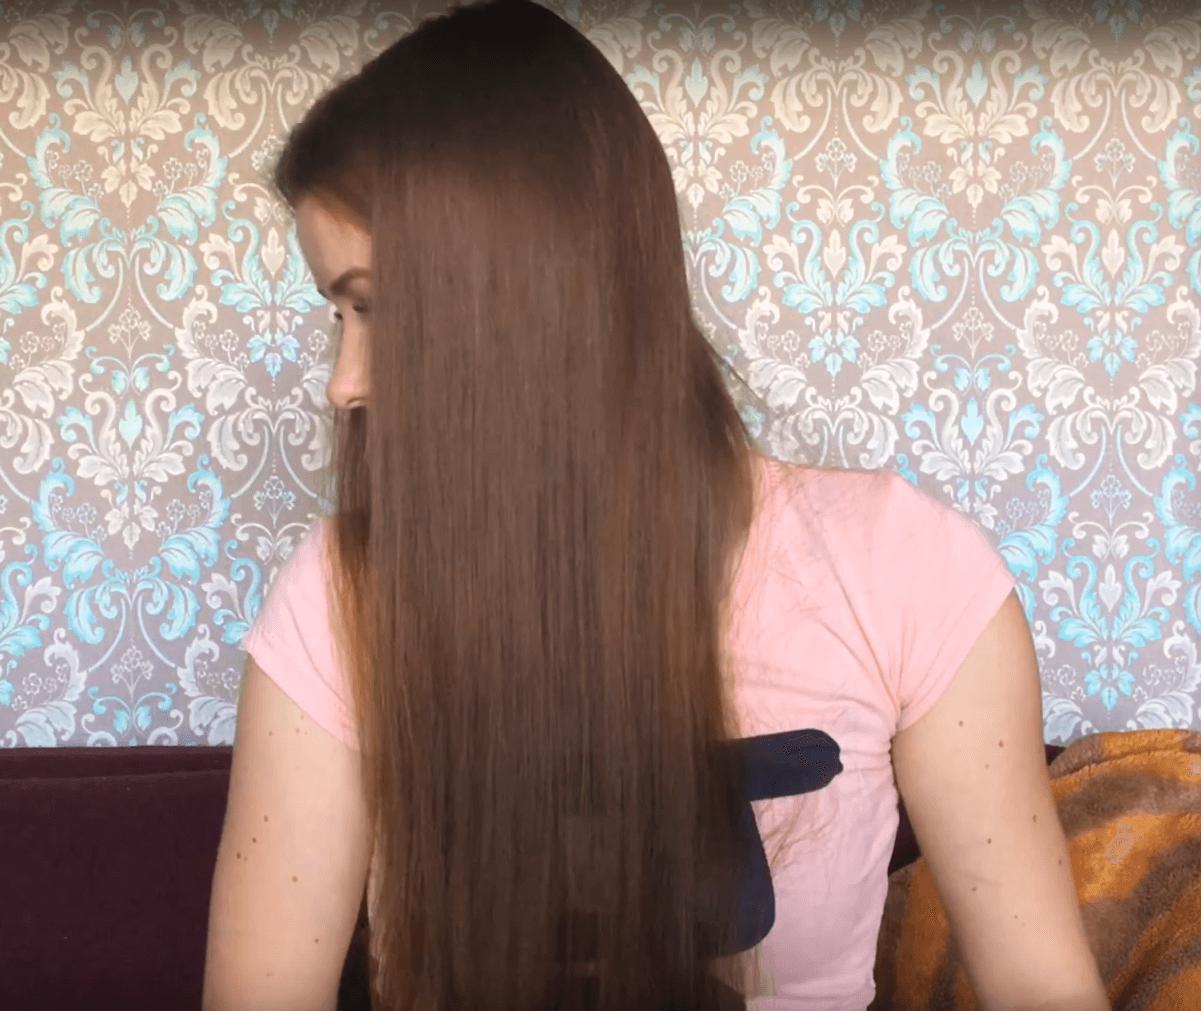 Уход за волосами в домашних условиях (маски, пилинги и т.д) 23